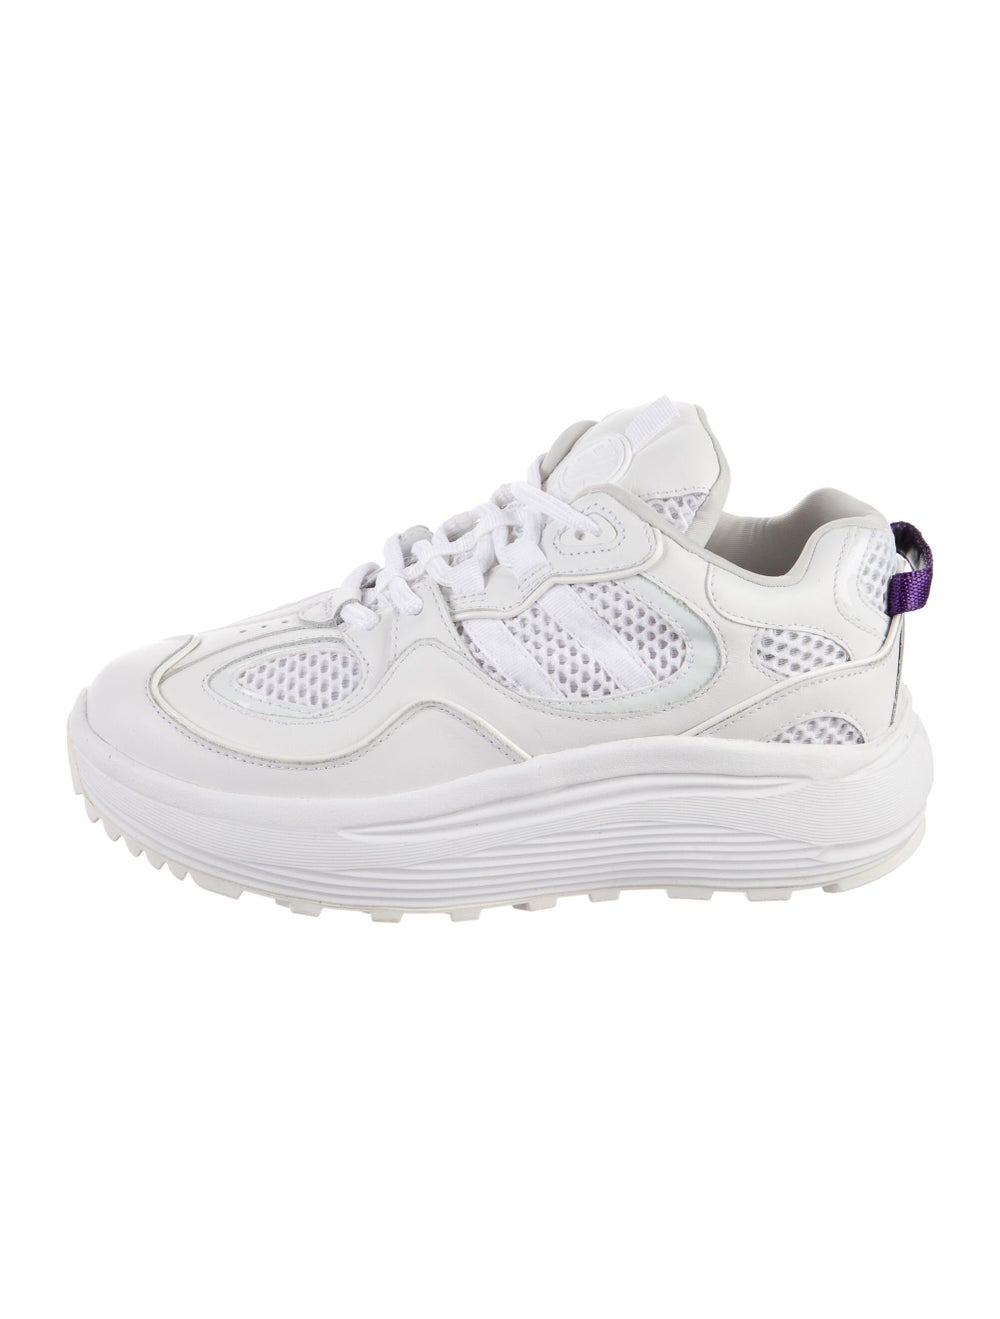 Eytys Snow Sneakers White - image 1